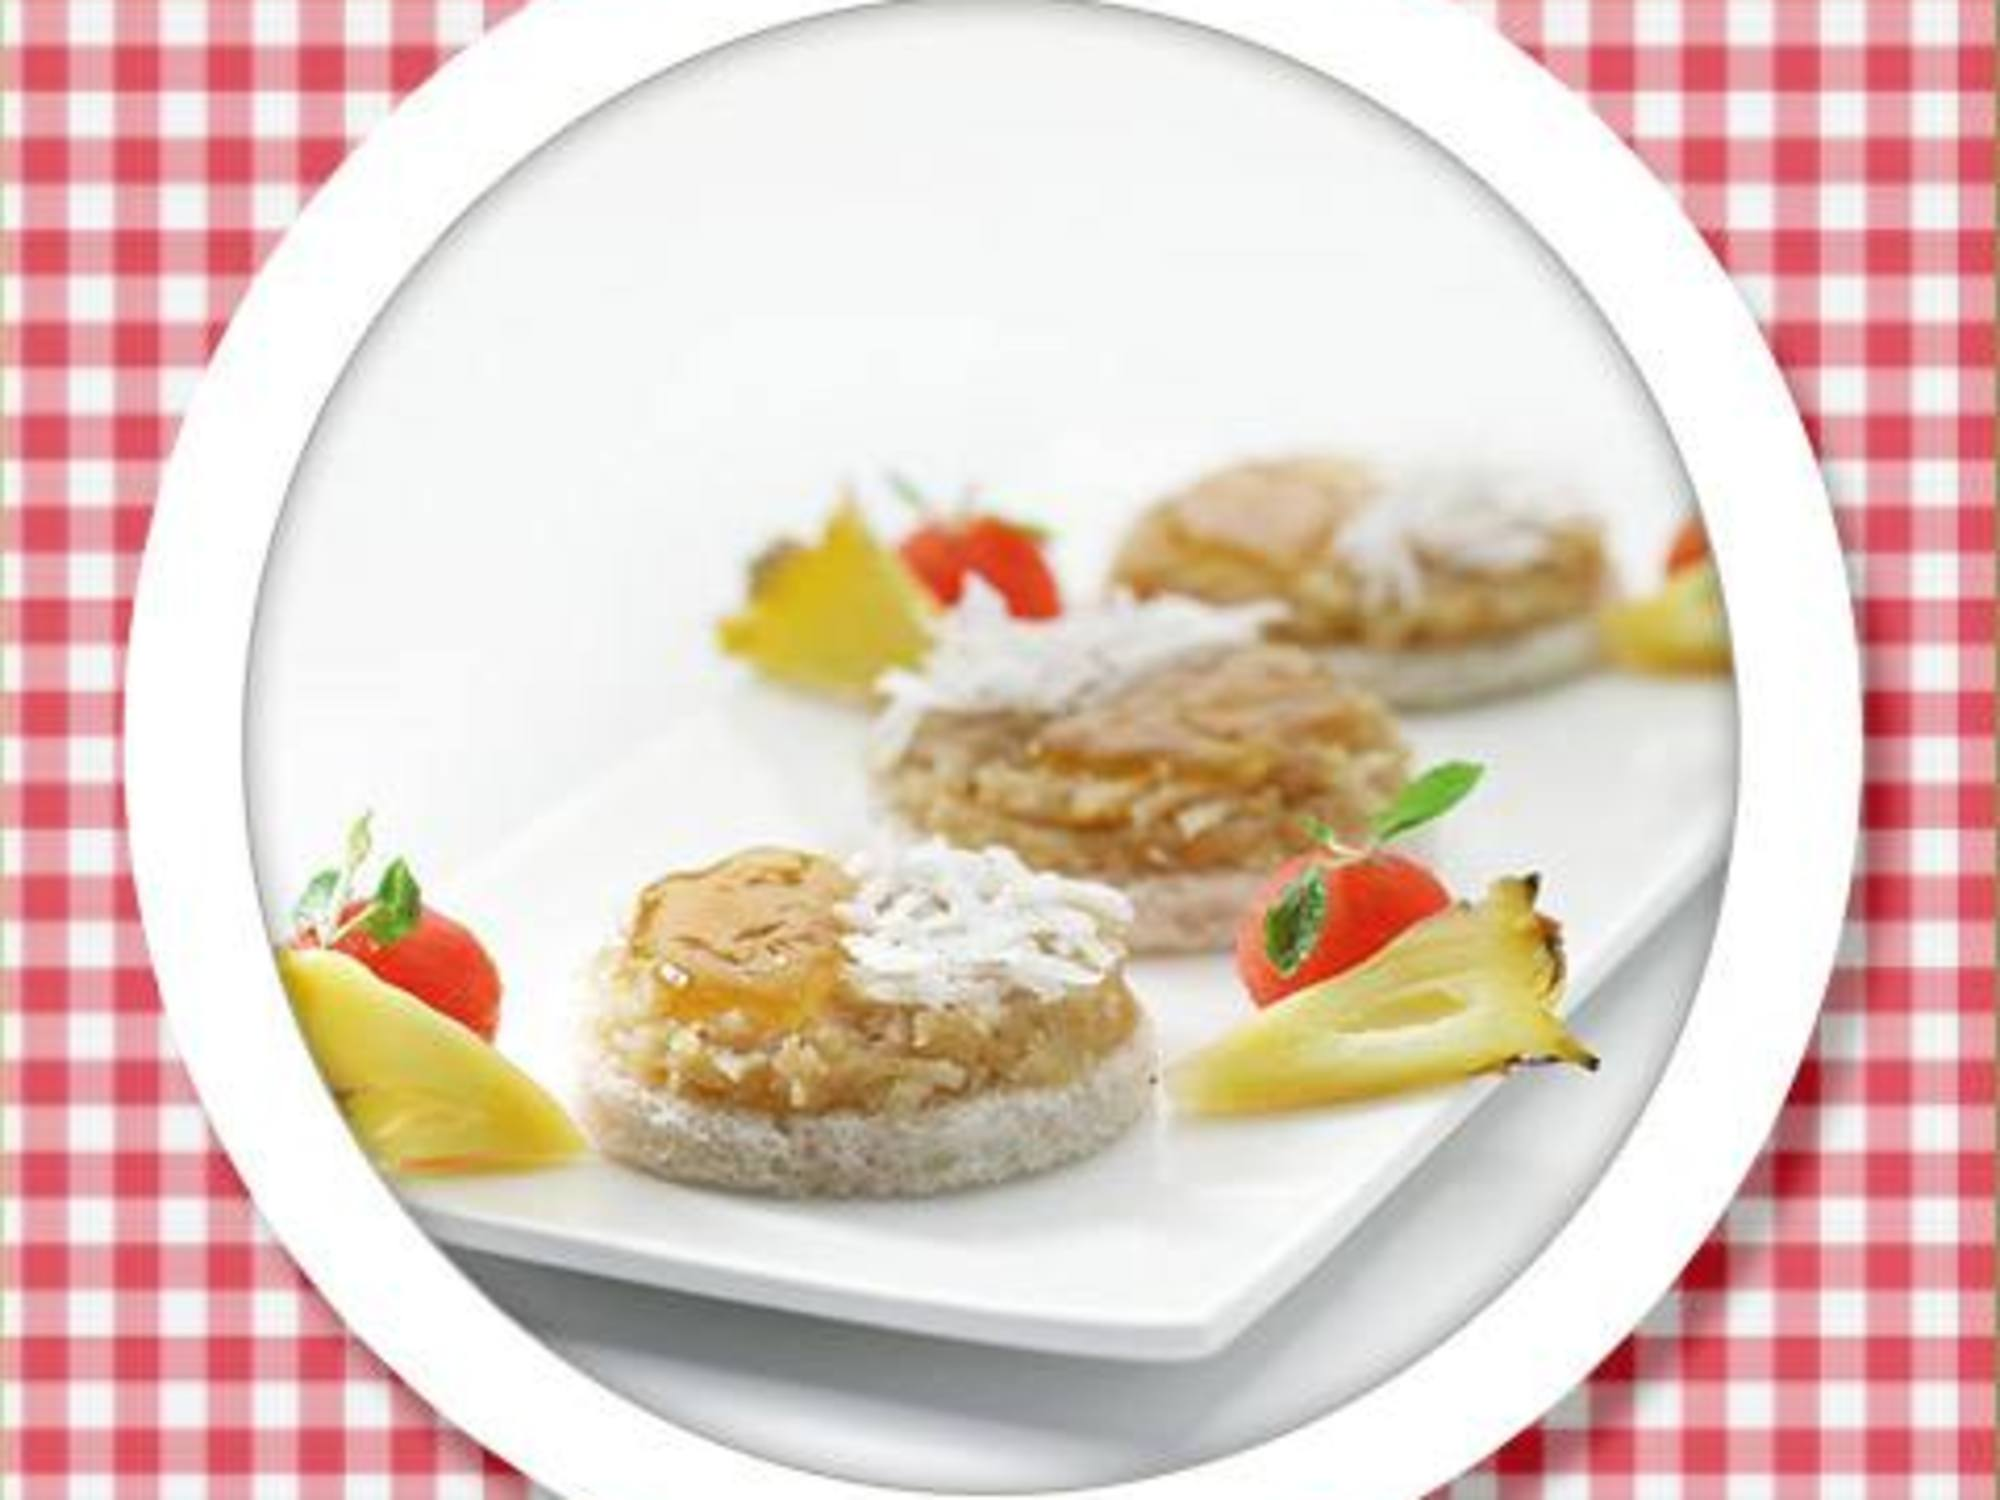 Recipe of Coconut & Jam On Bread